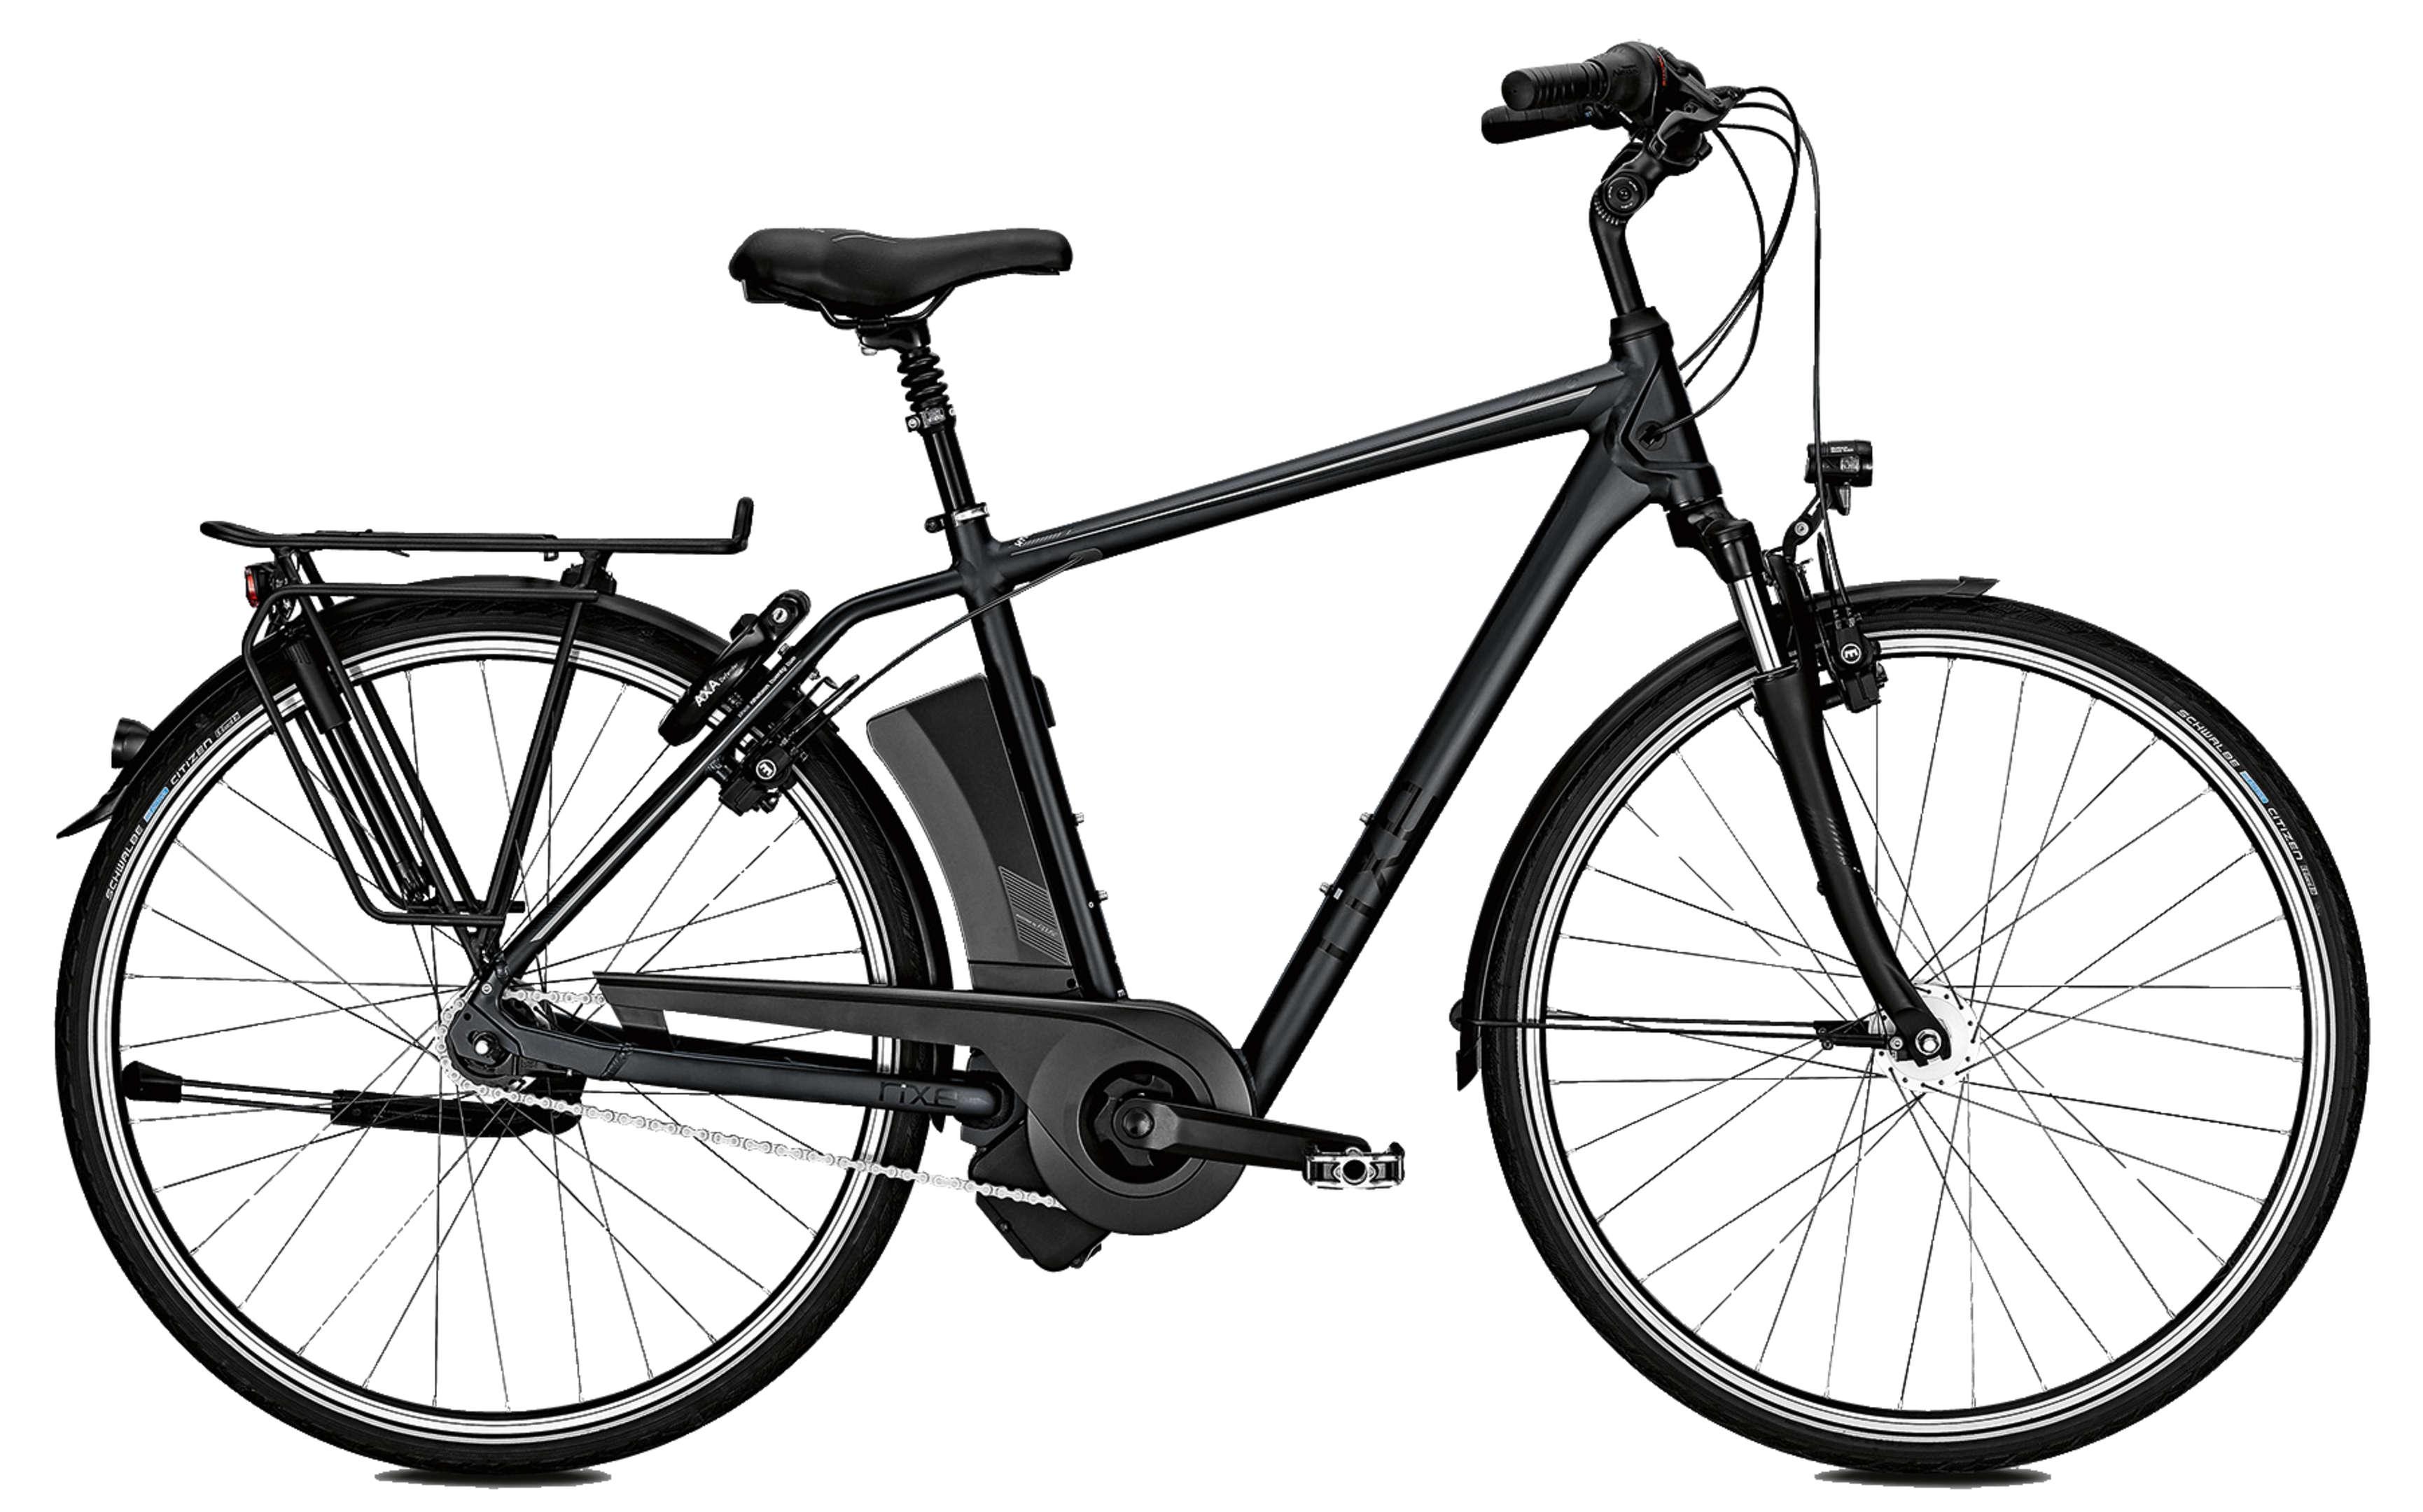 rixe e bike bordeaux i7r 11 0ah 36v eurorad. Black Bedroom Furniture Sets. Home Design Ideas